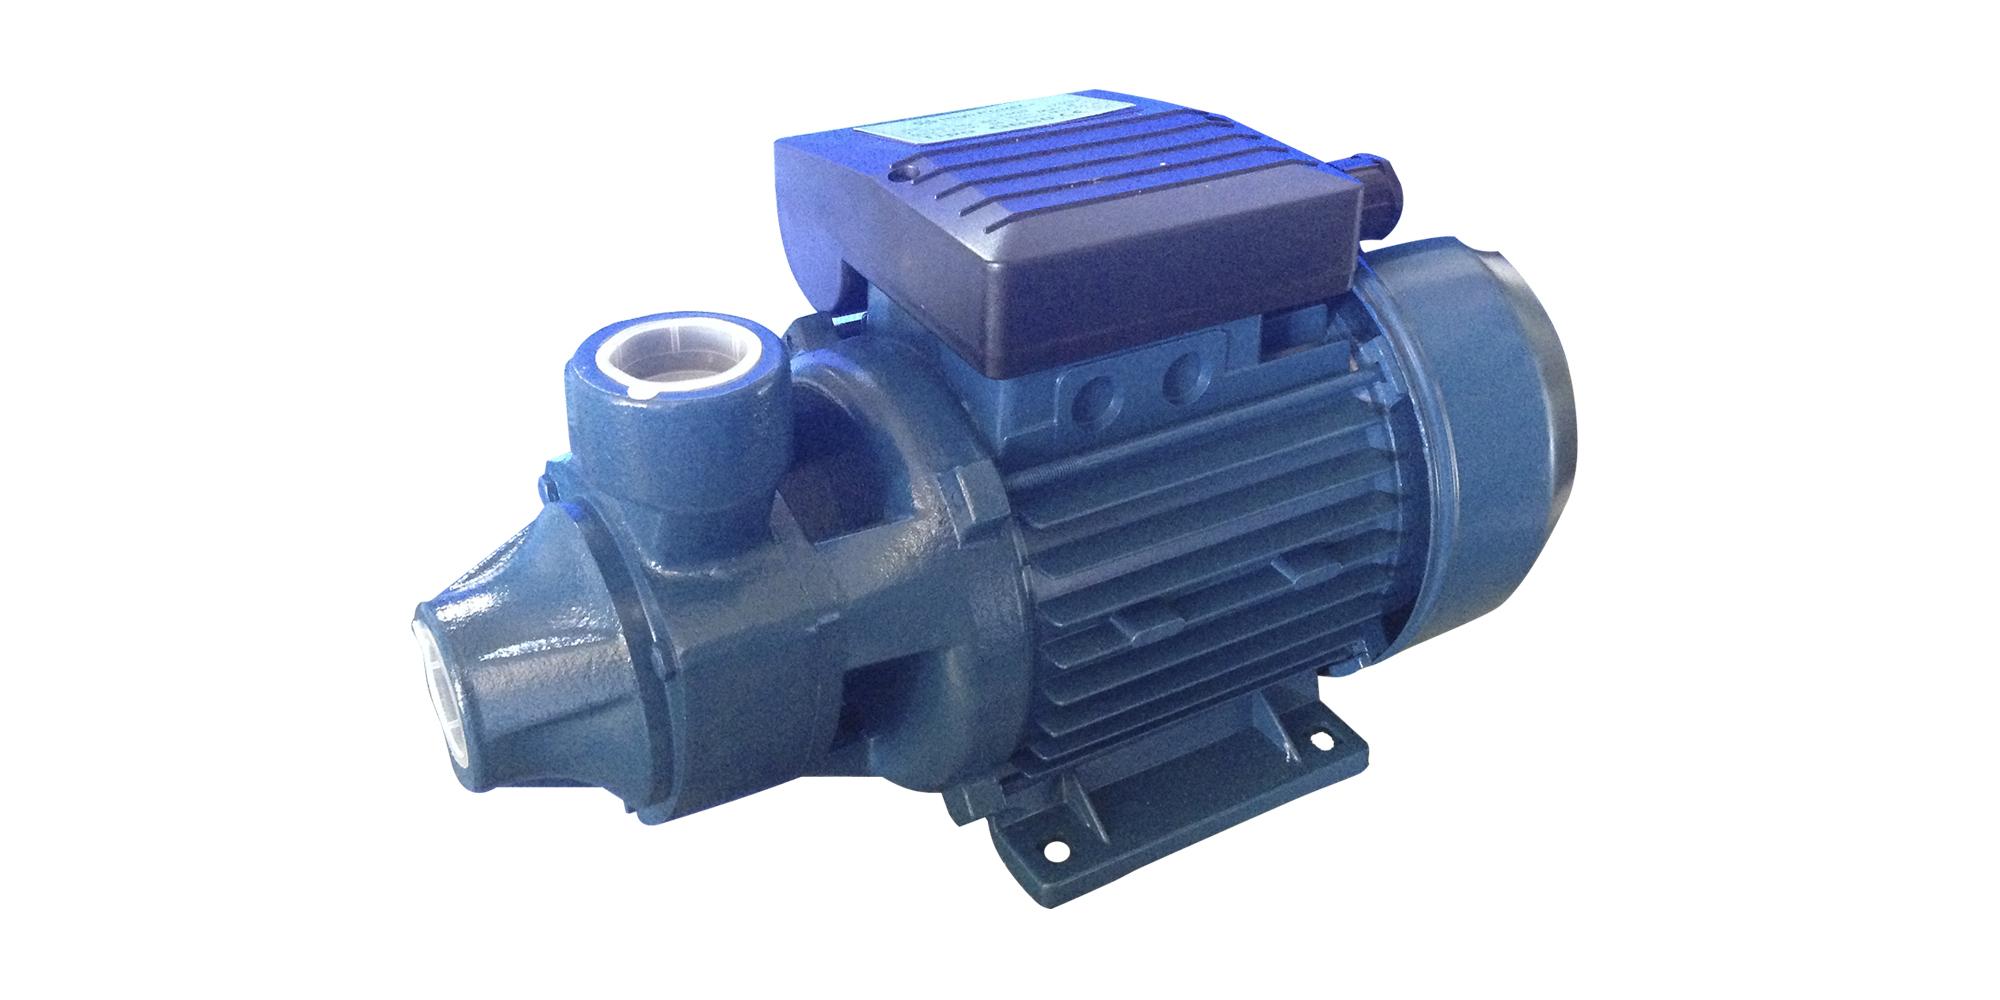 Bomba de agua perif rica high power de 1hp alkada - Bombas de agua ...